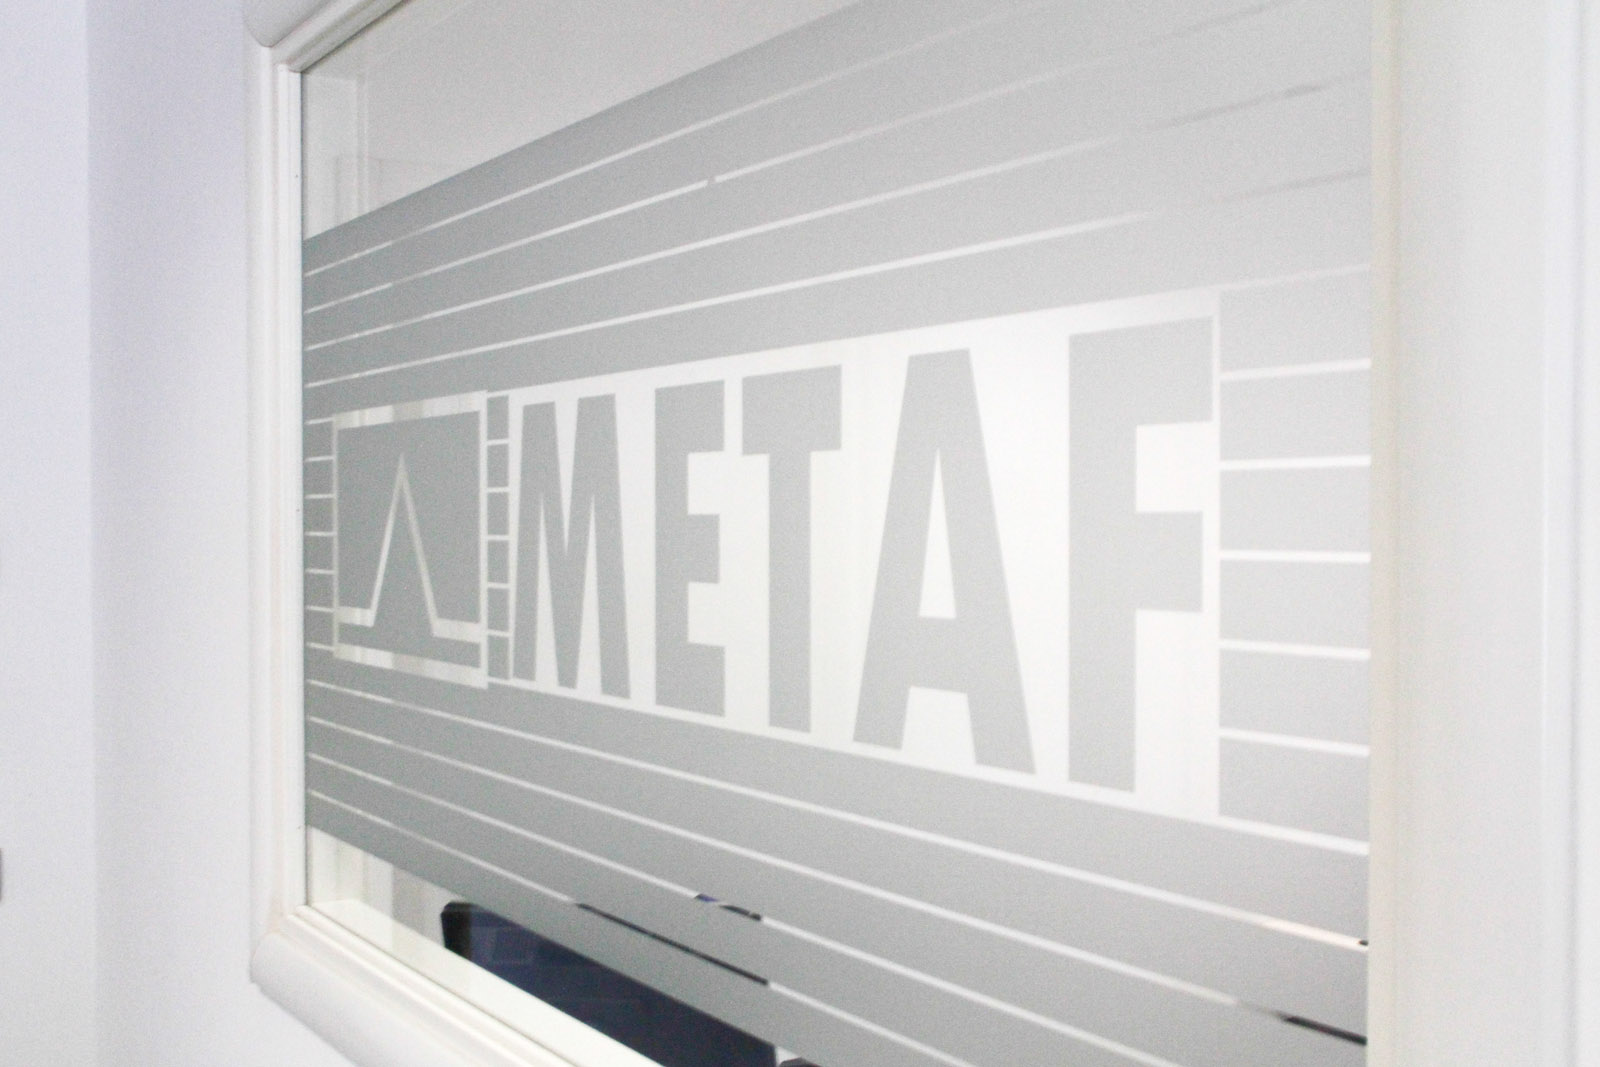 Metaf Vendita Noleggio Strumenti Elettronici